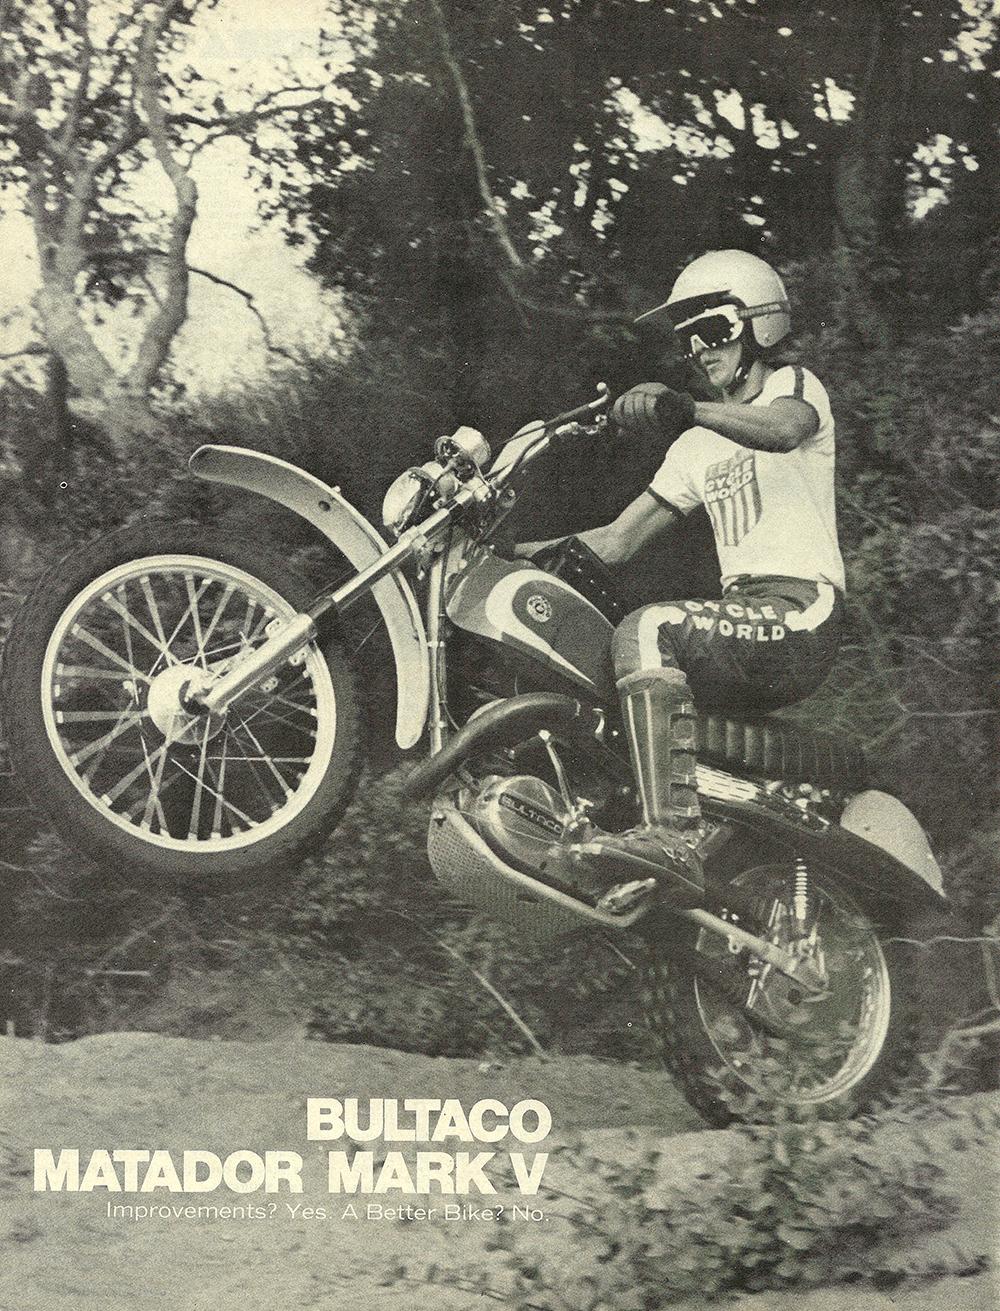 1974 Bultaco Matador 250 Mark 5 road test 01.jpg